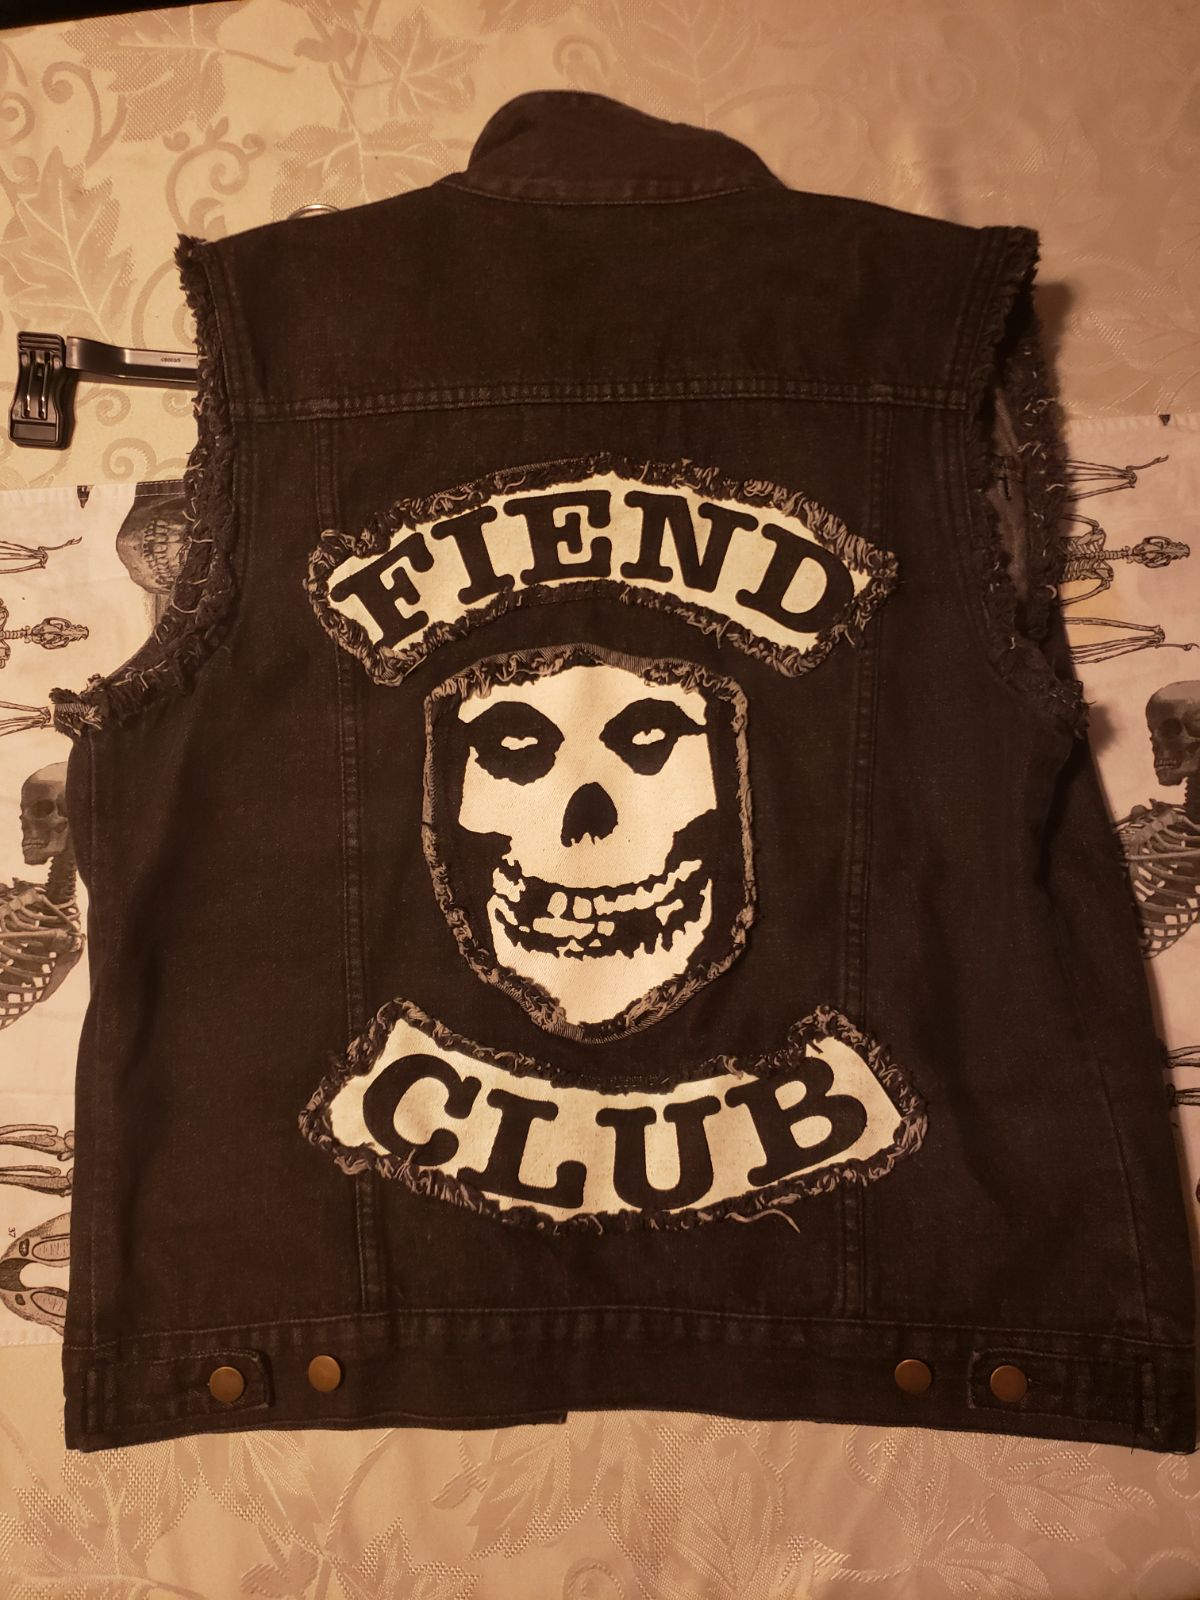 Misfits 'Fiend Club' denim jacket/vest